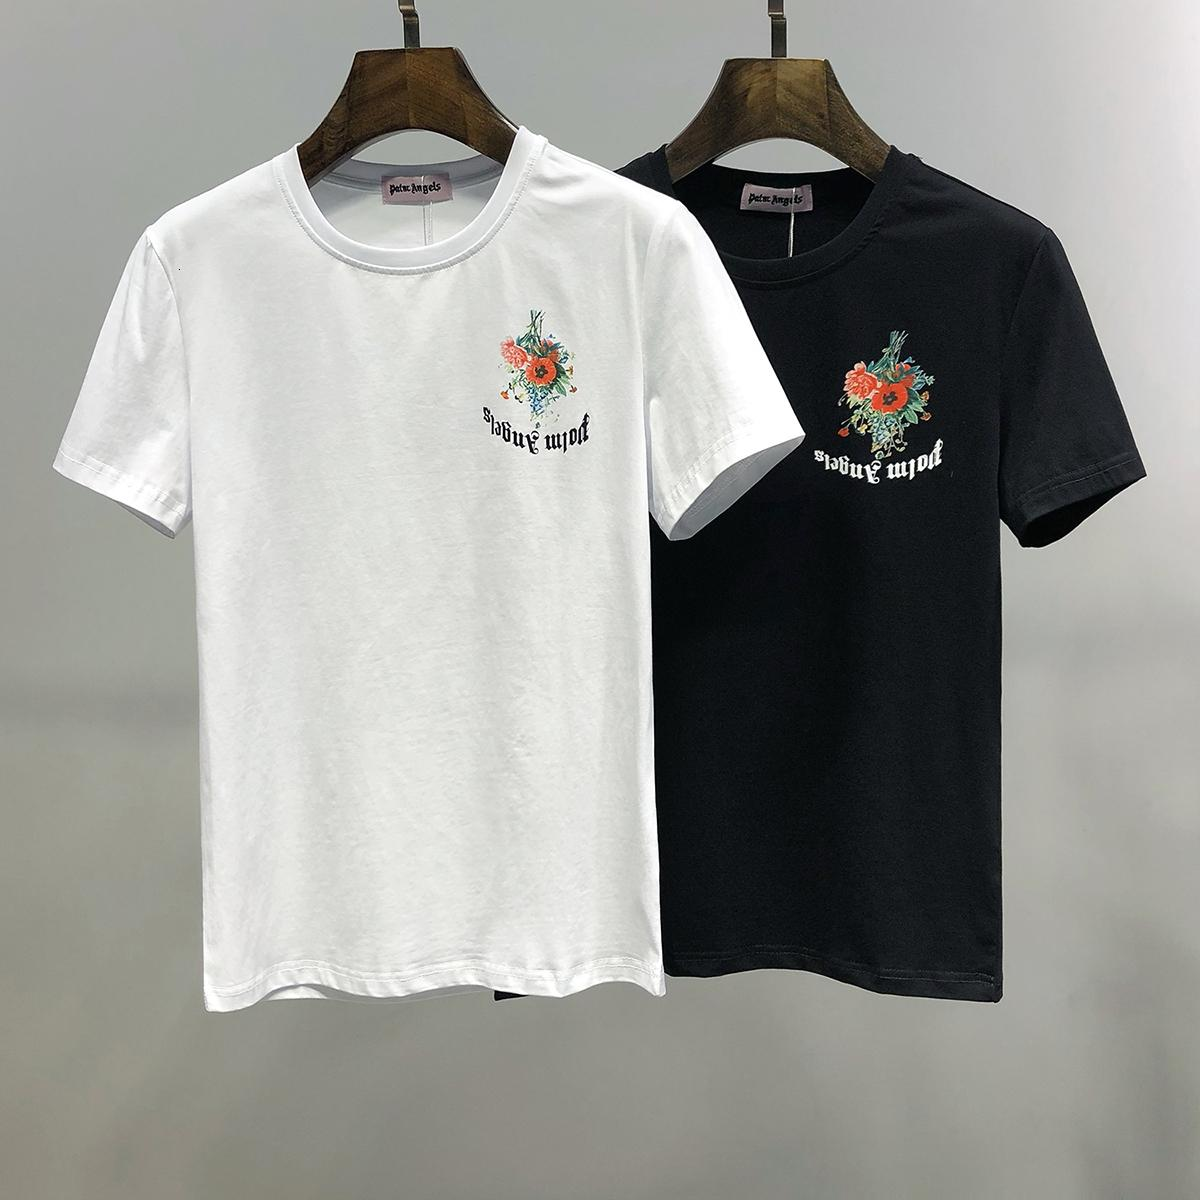 Mens T-Shirt Casual Casual T-Shirt Size M-3XL Comfortable Joker WSJ000#1116129